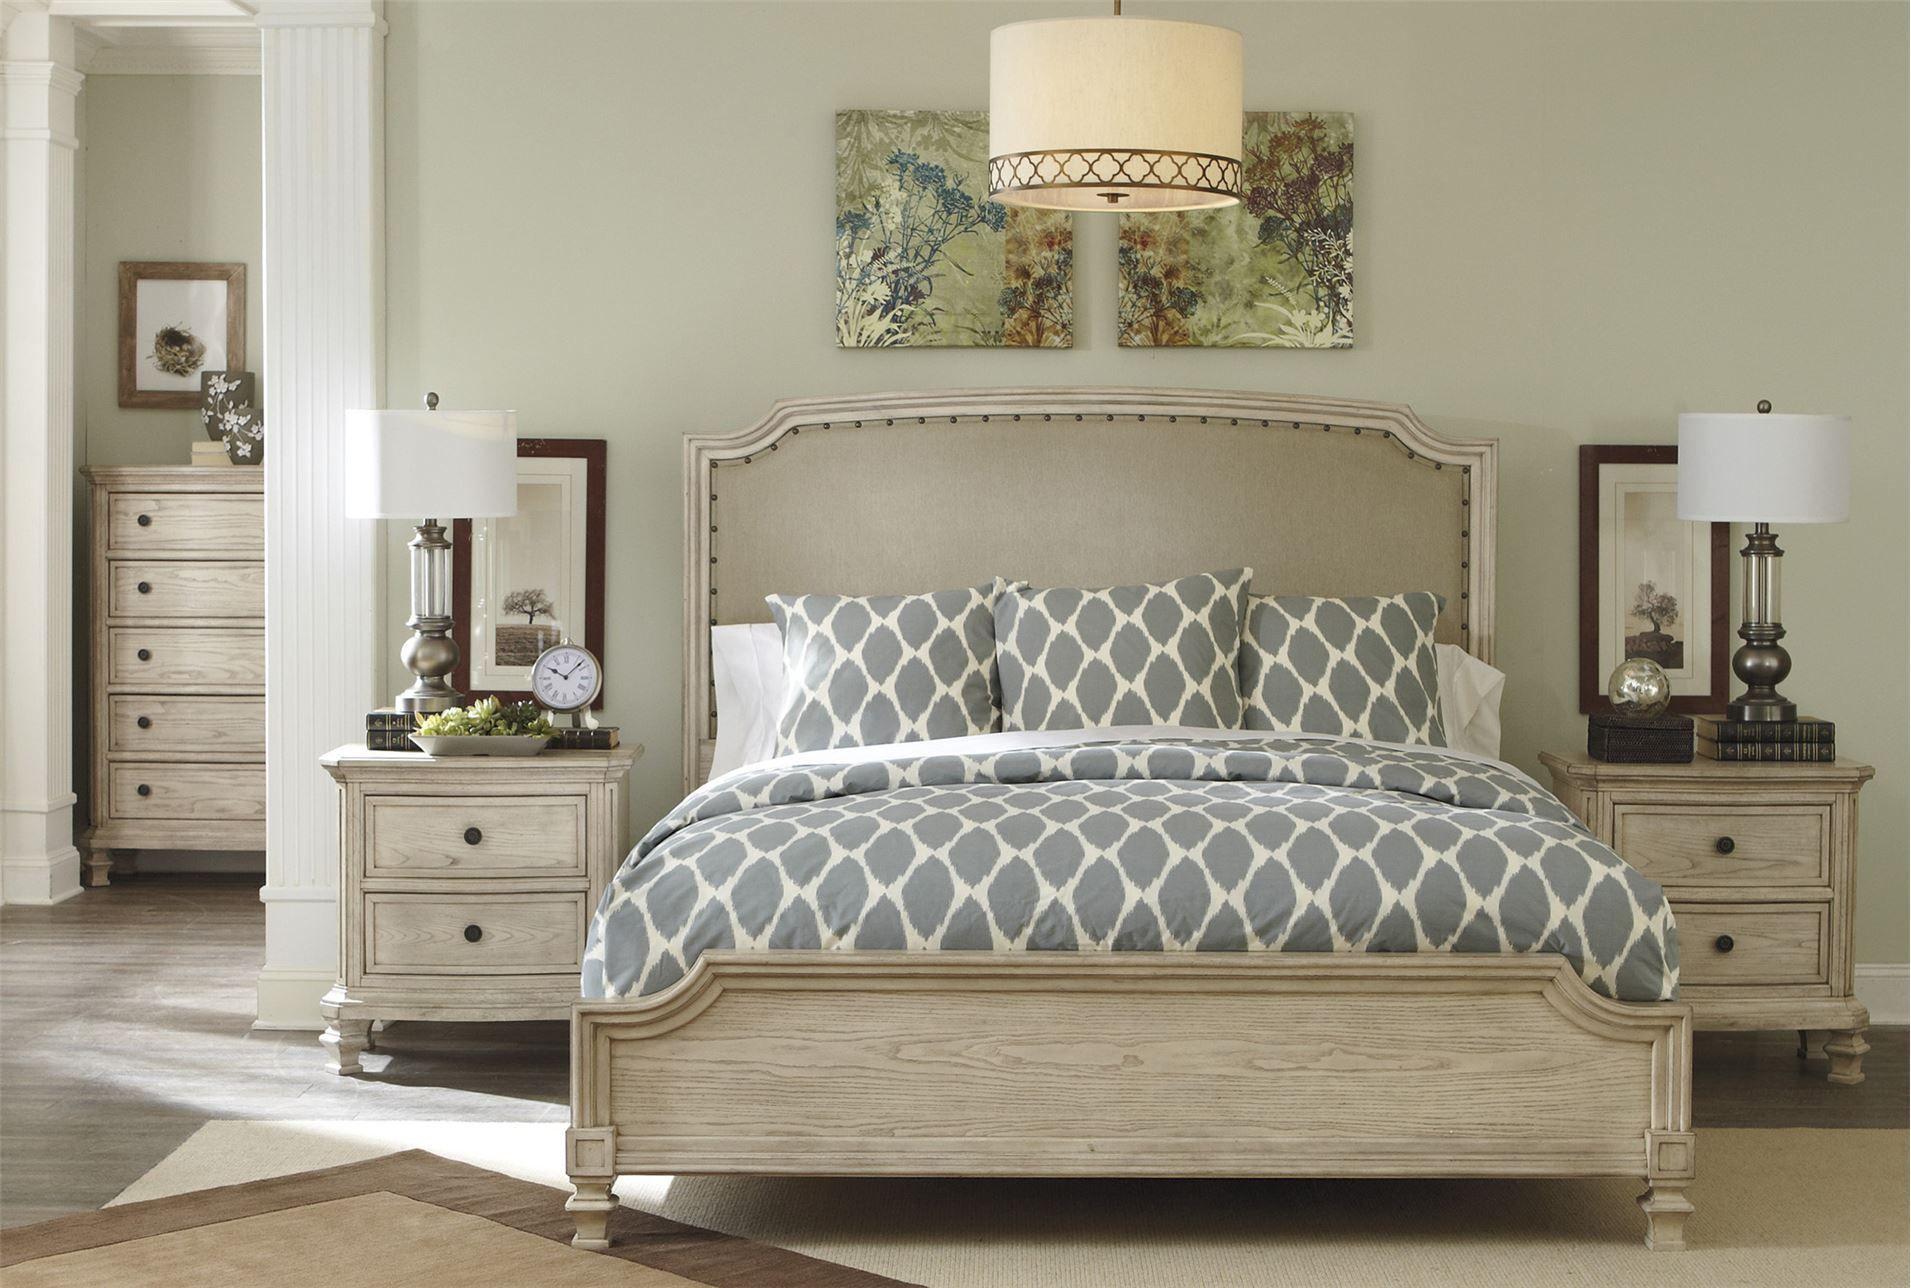 Demarlos Eastern King Panel Bed Bedroom Furniture Sets Upholstered Bedroom Bedroom Sets Queen Bedroom set living spaces